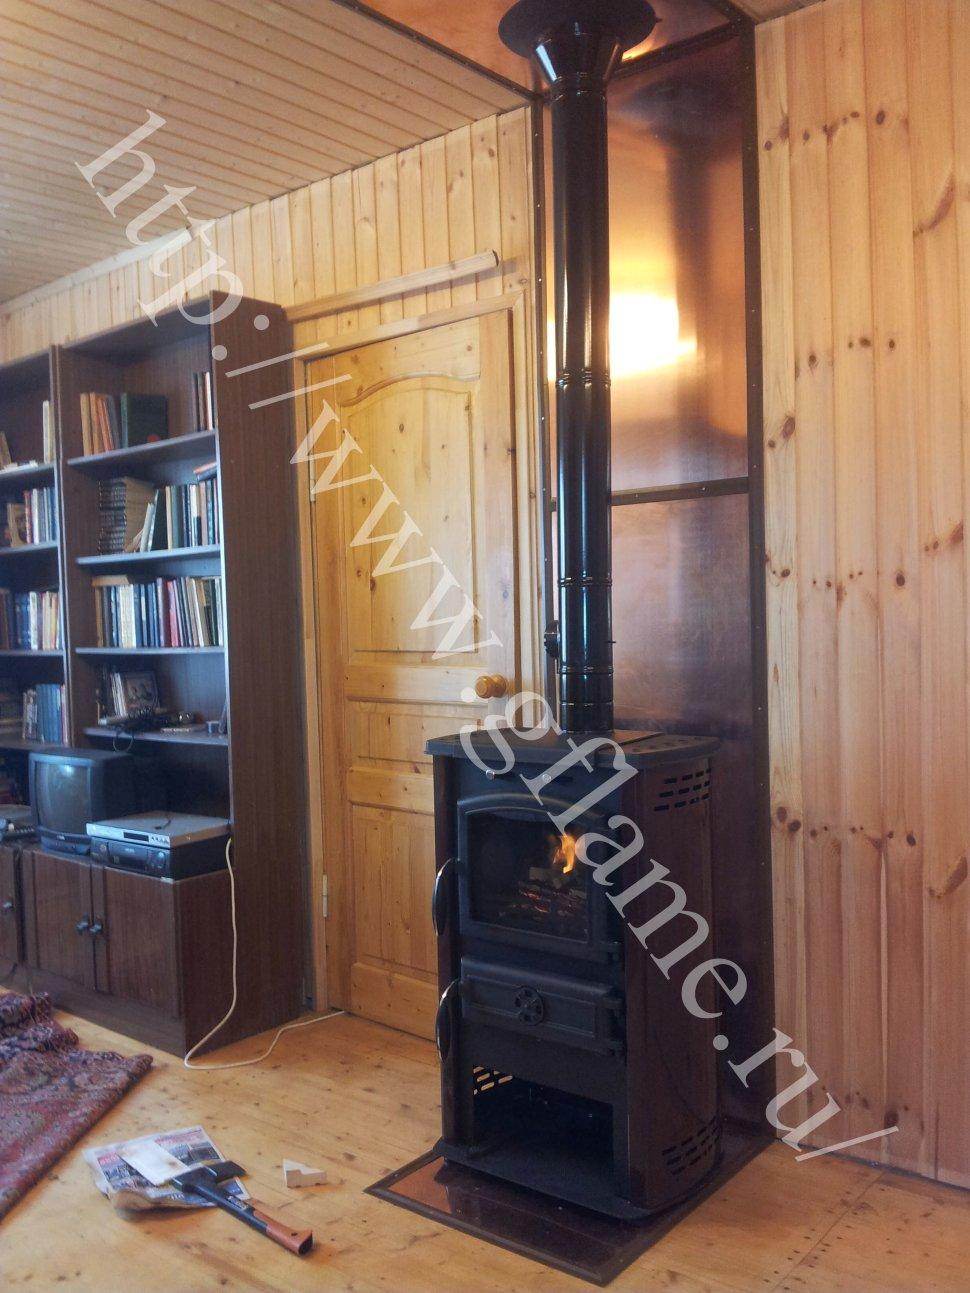 tarif installation poele a bois design jotul f400 aussillon 81. Black Bedroom Furniture Sets. Home Design Ideas